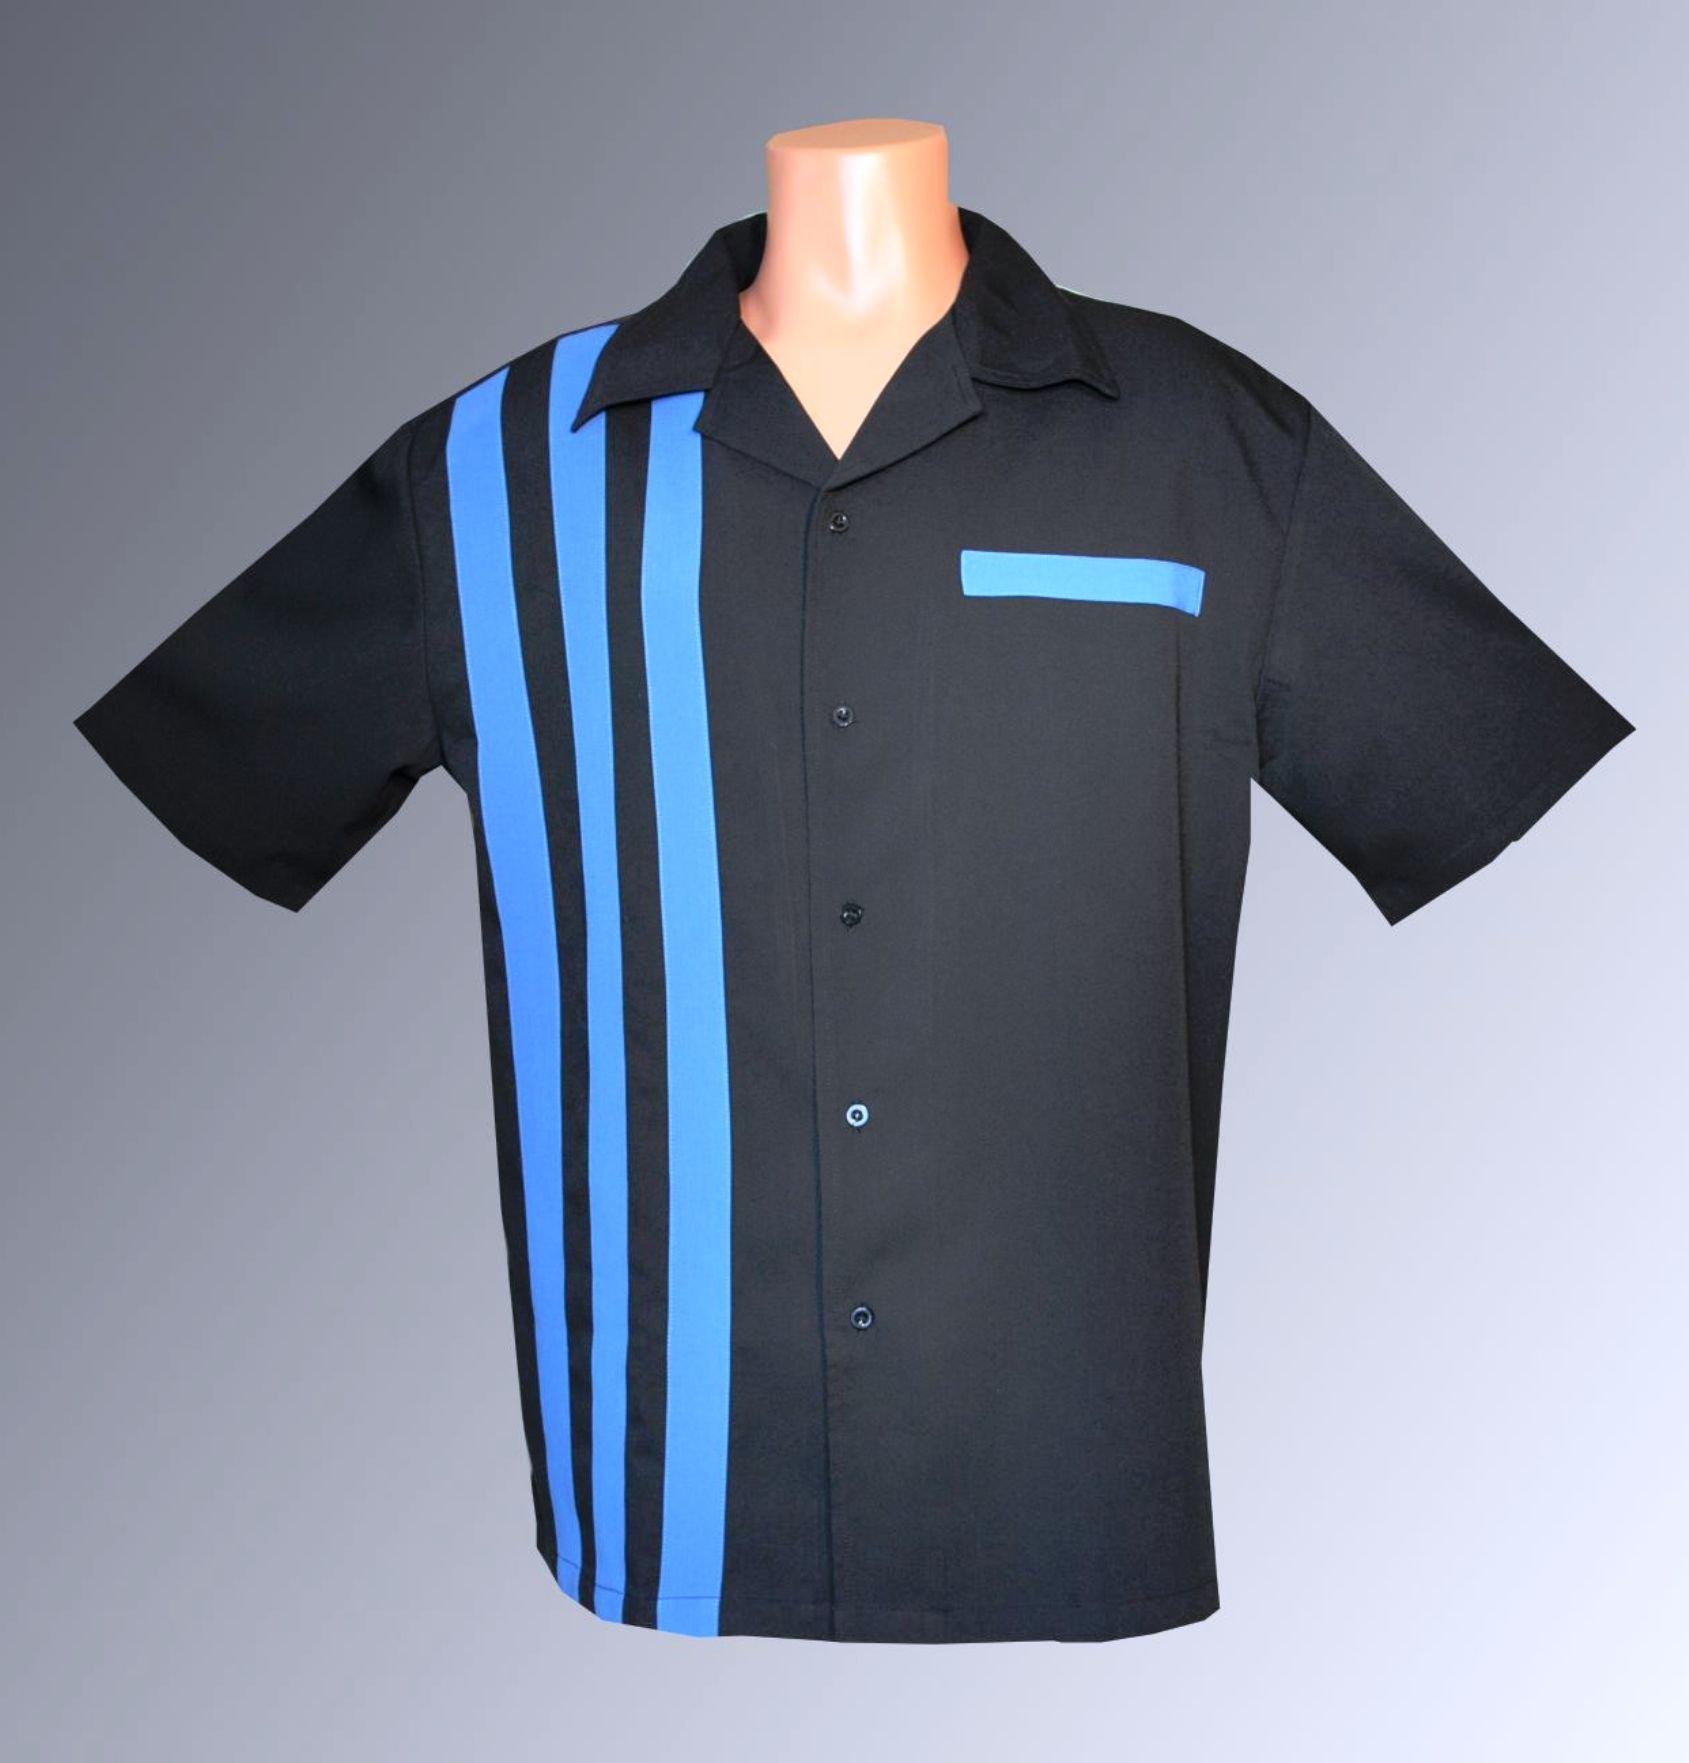 Attila Bowling Shirt Big and Tall Retro 50s Charlie Sheen BluRef Pocket (Medium)